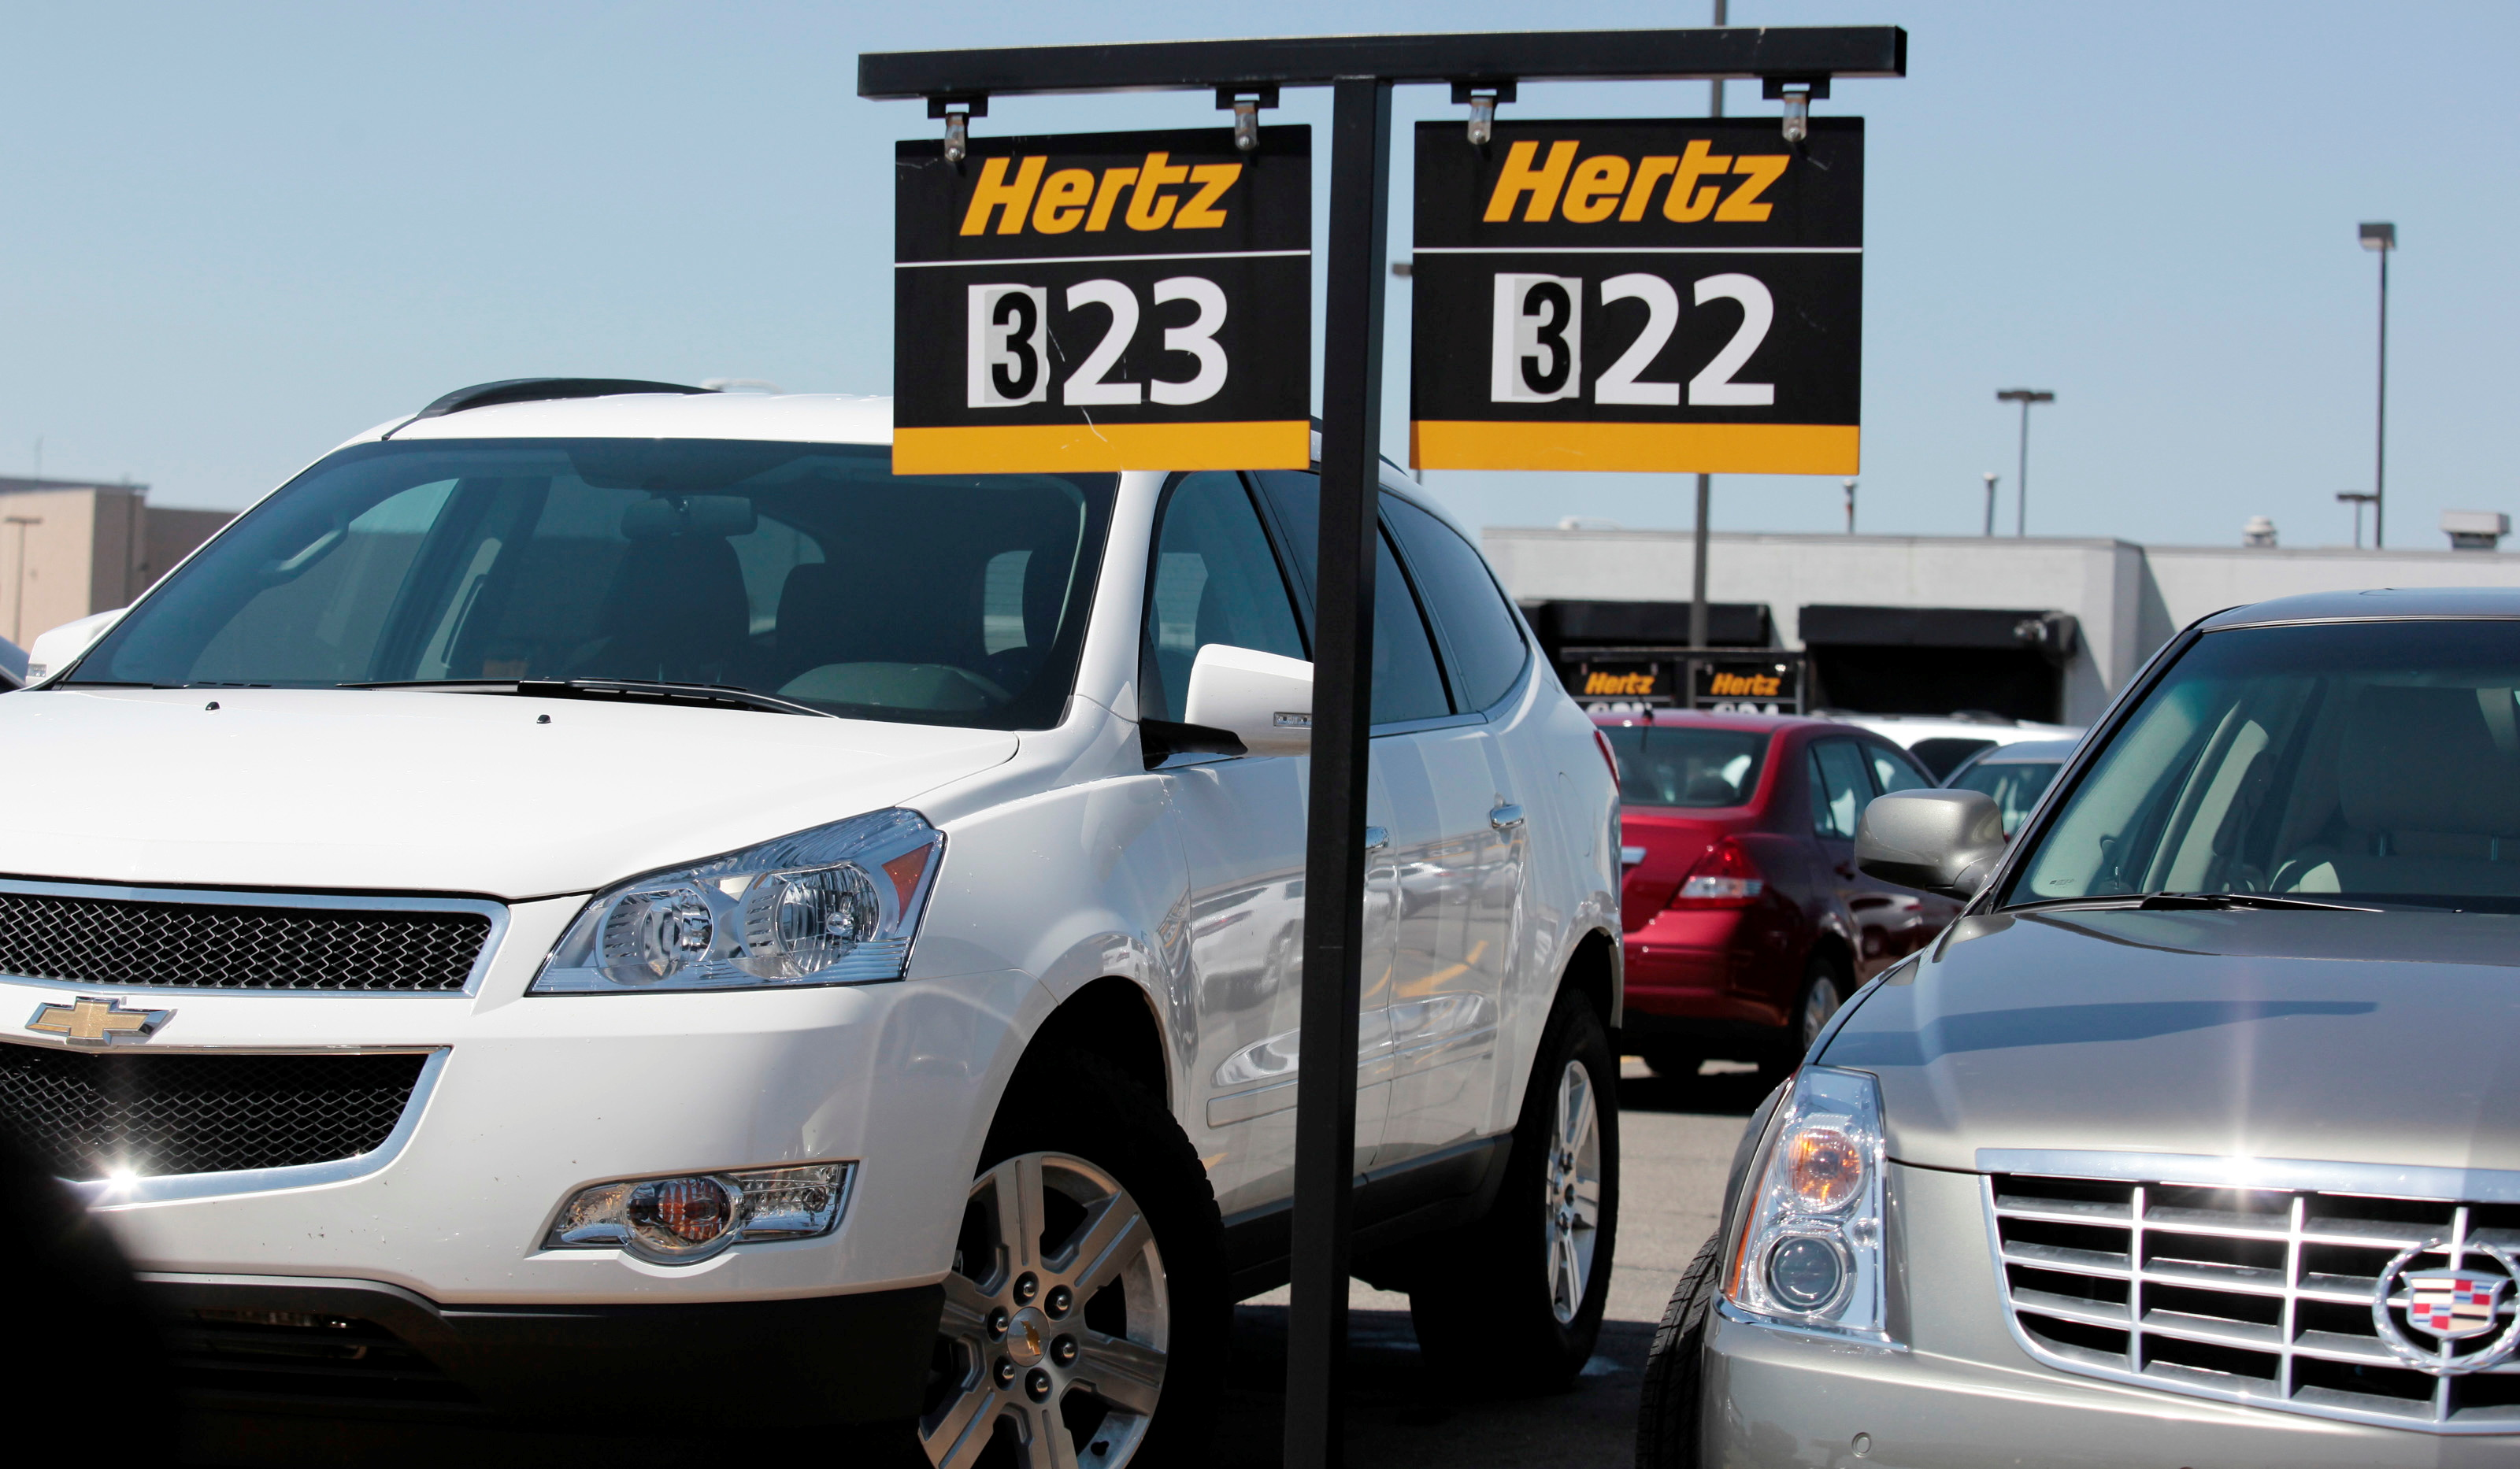 Hertz rental cars are parked in a rental lot near Detroit Metropolitan airport in Romulus, Michigan May 9, 2011. REUTERS/Rebecca Cook